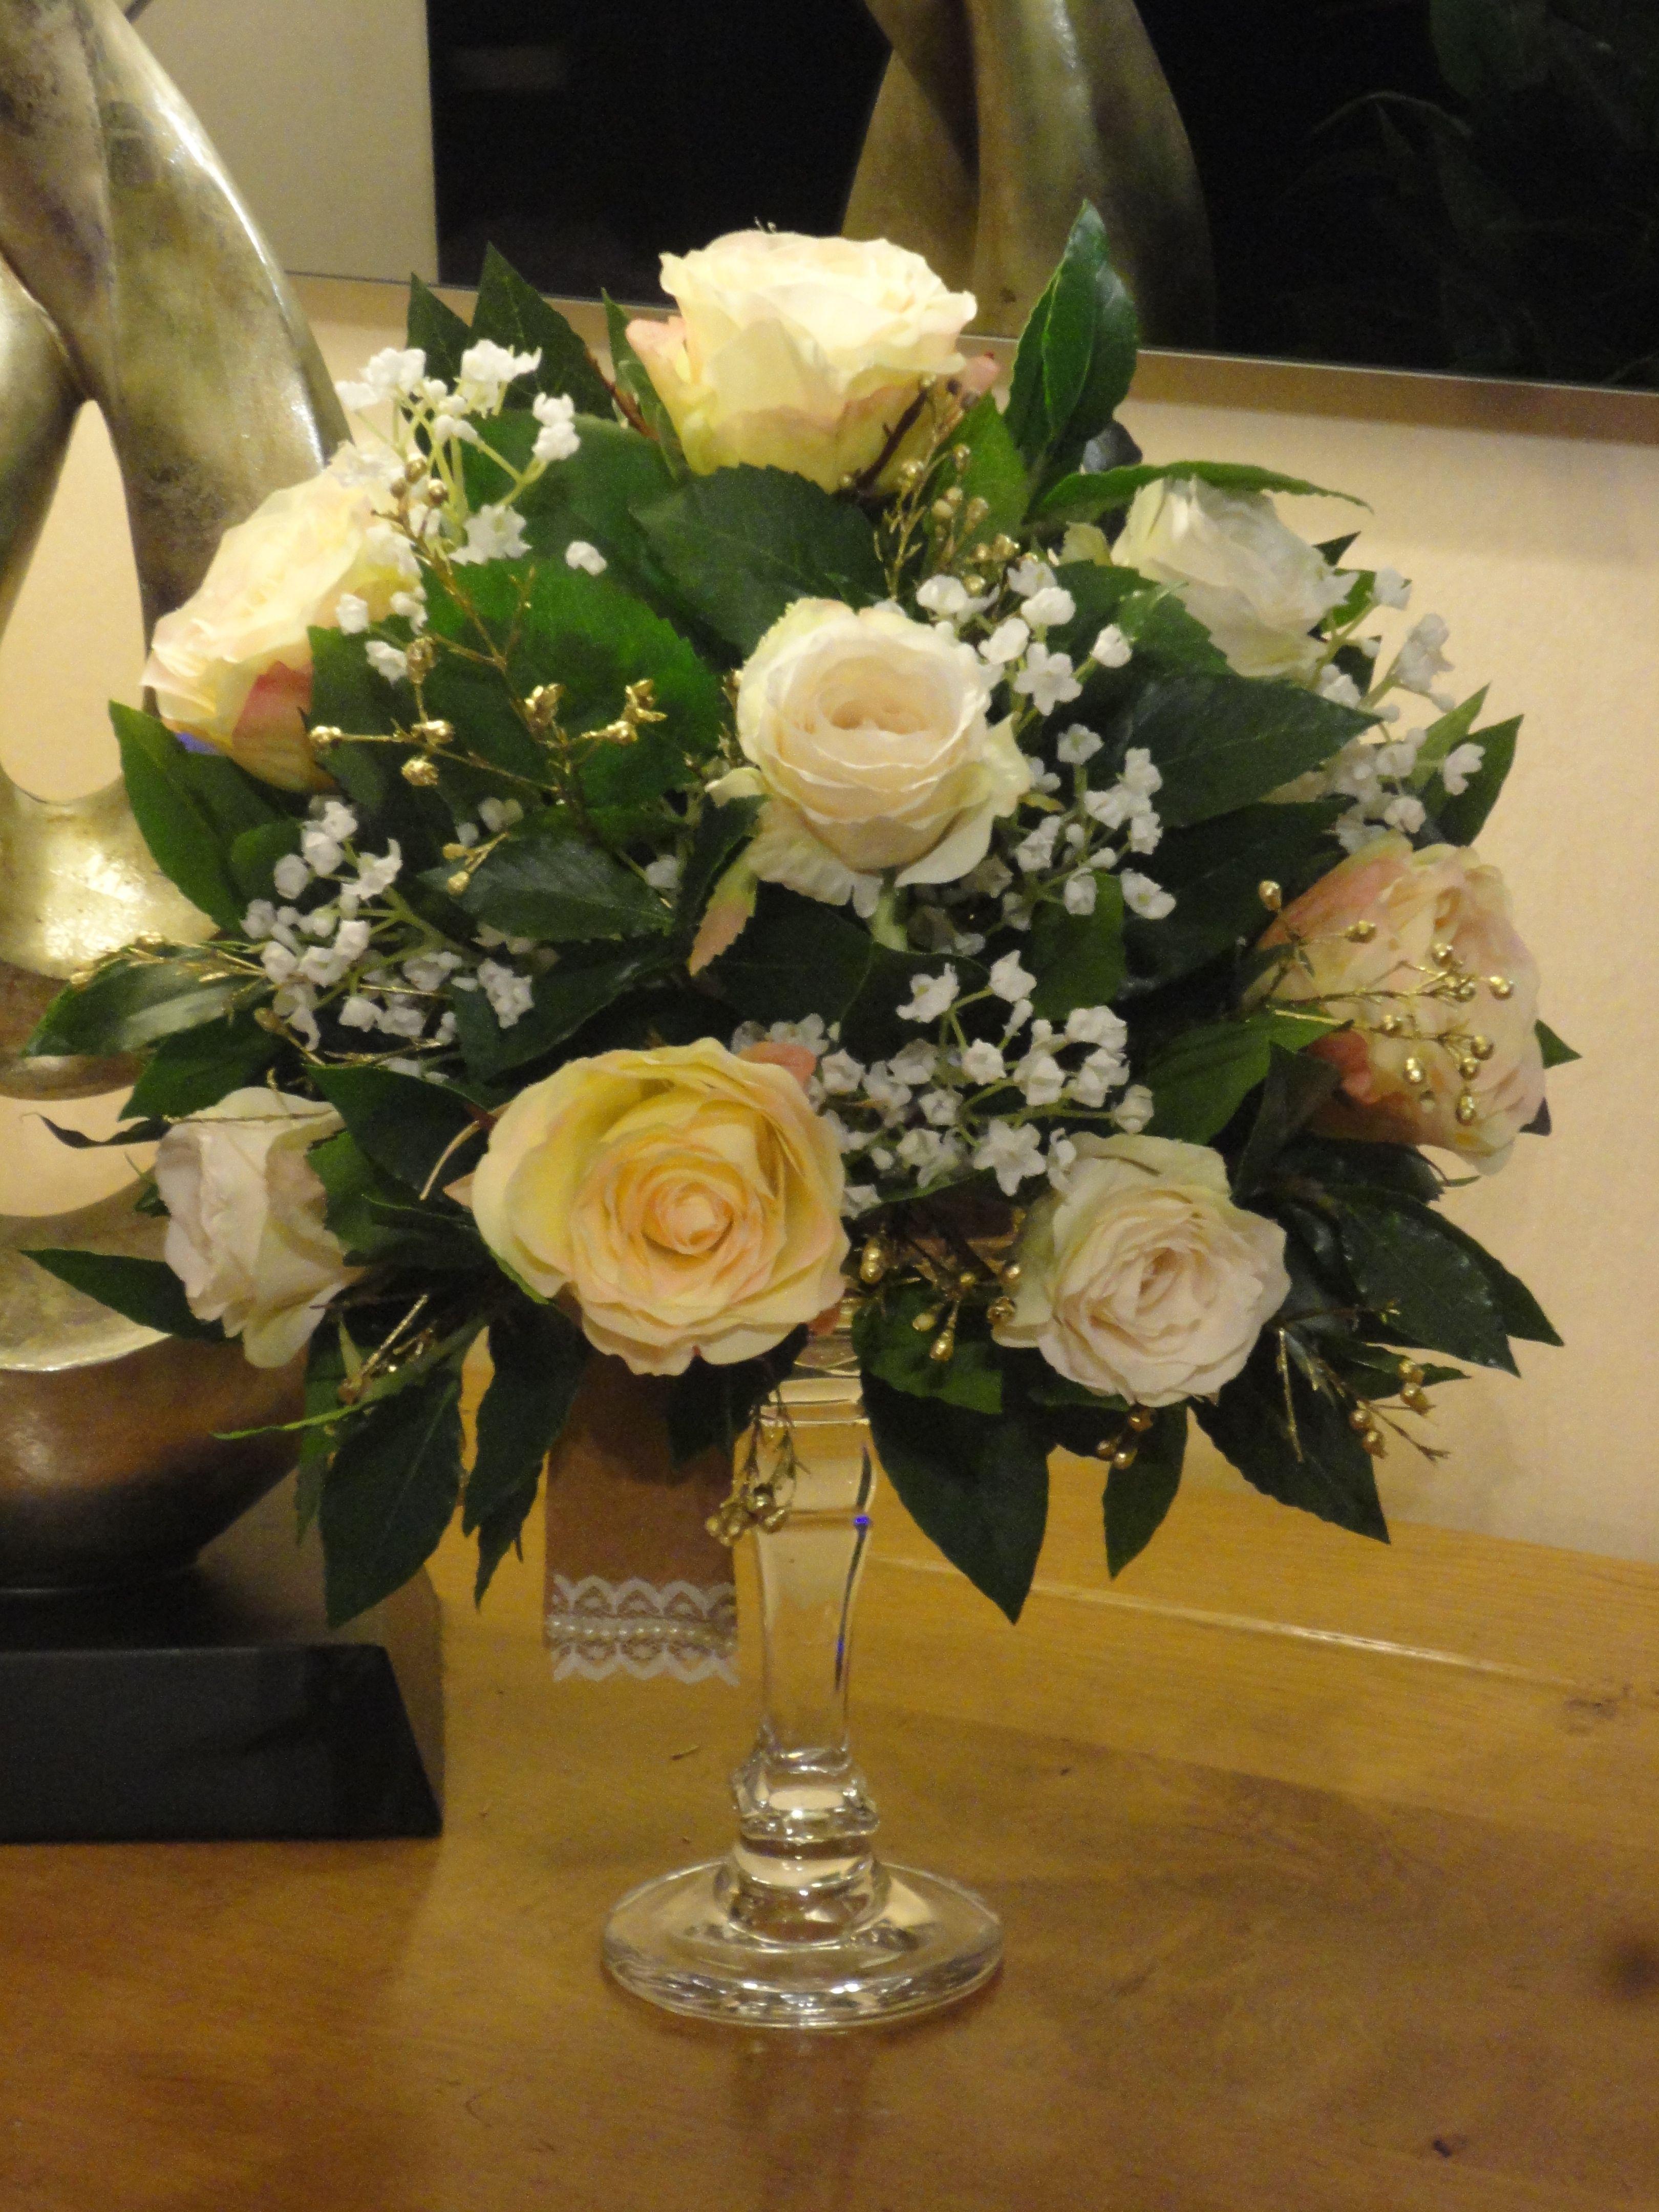 Wedding Flowers Flowers For 50th Wedding Anniversary | arrangements ...